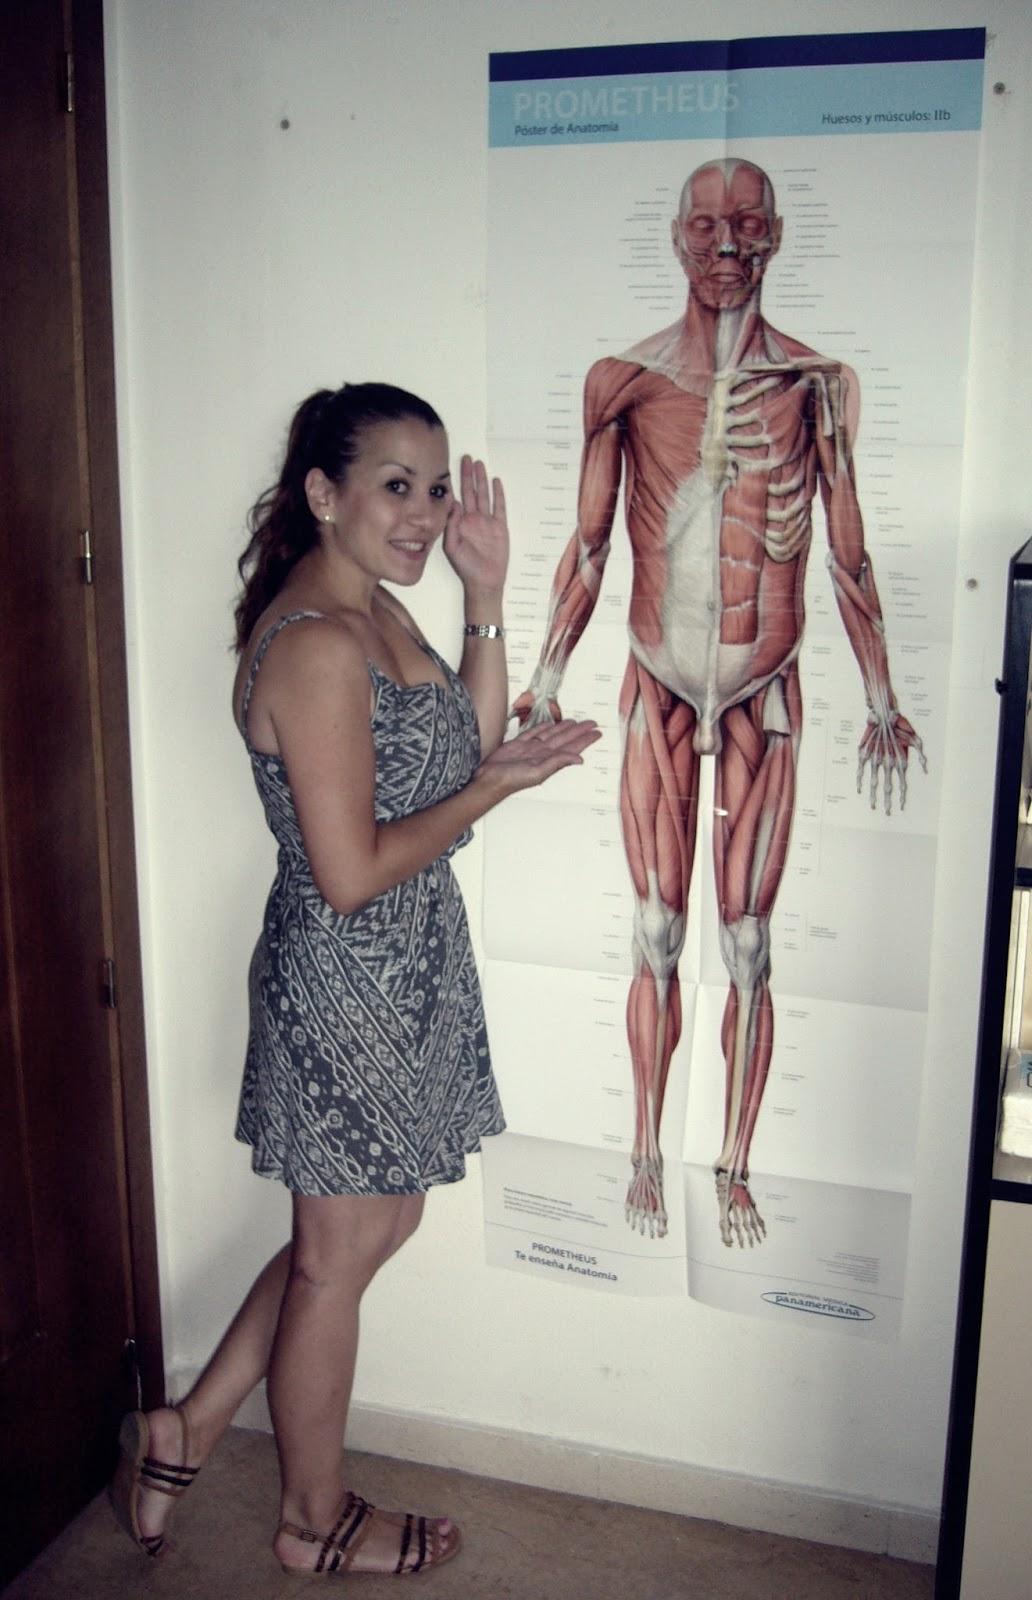 TO\'s En Formación: Anatomía Humana. Prometheus